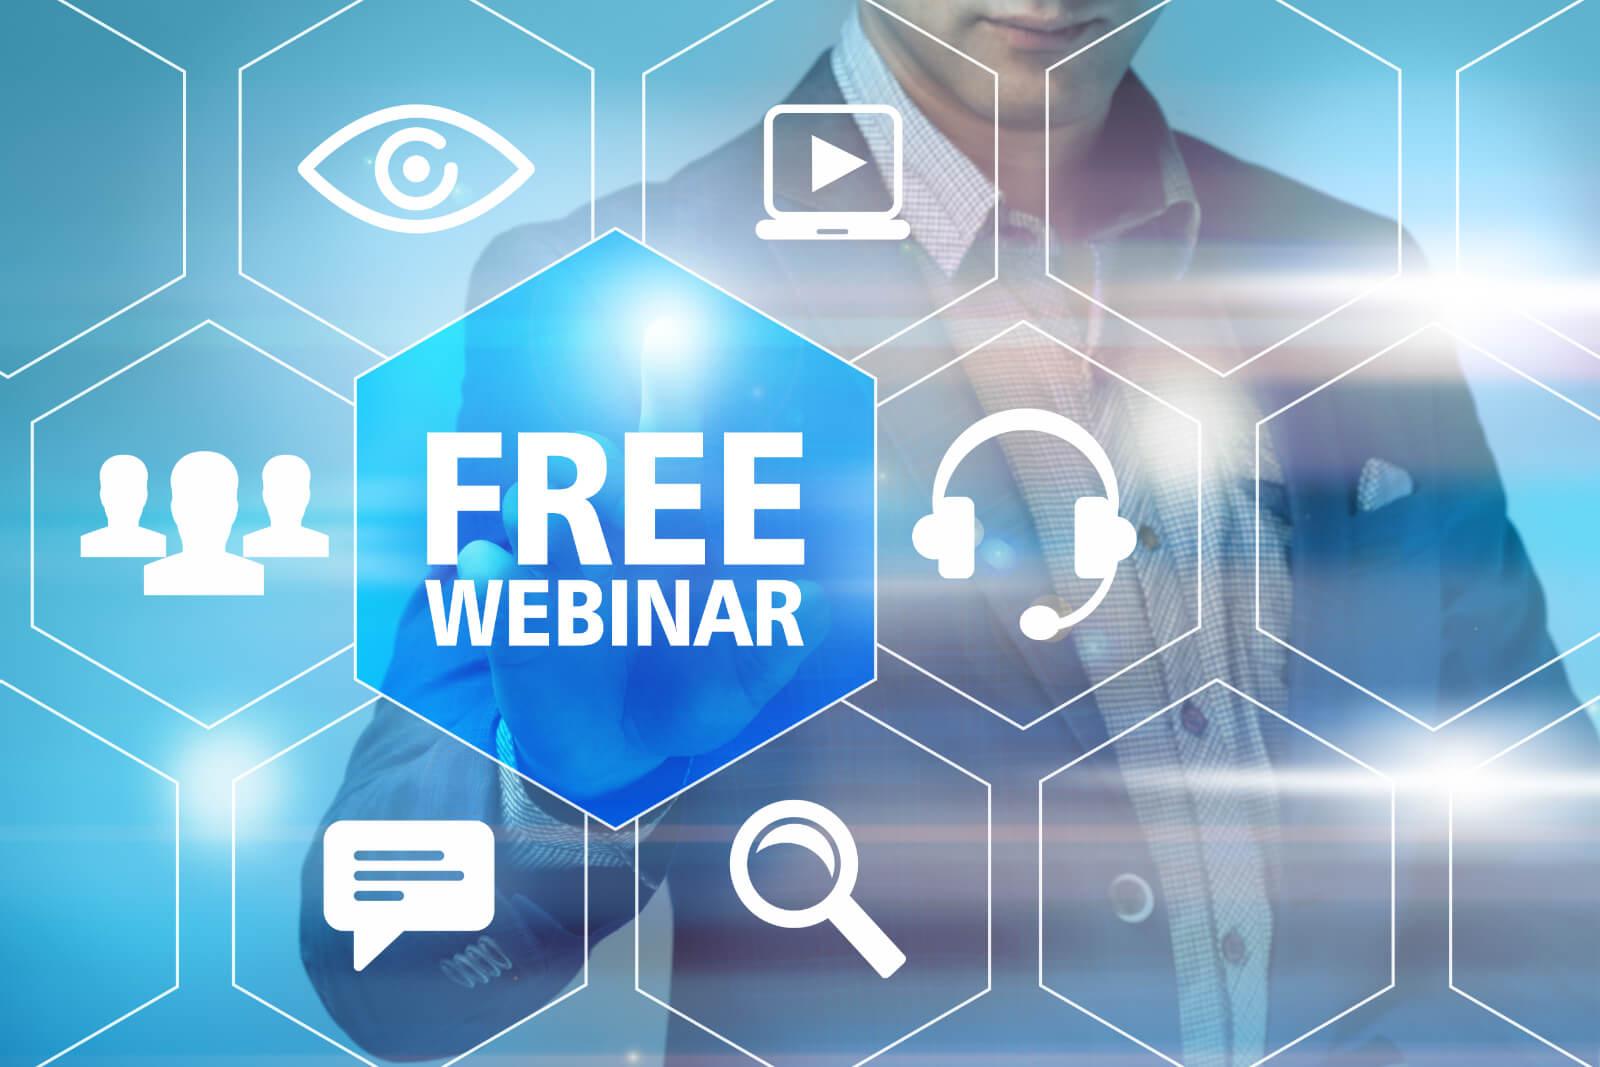 Setting a Webinar Marketing Attendee Goal